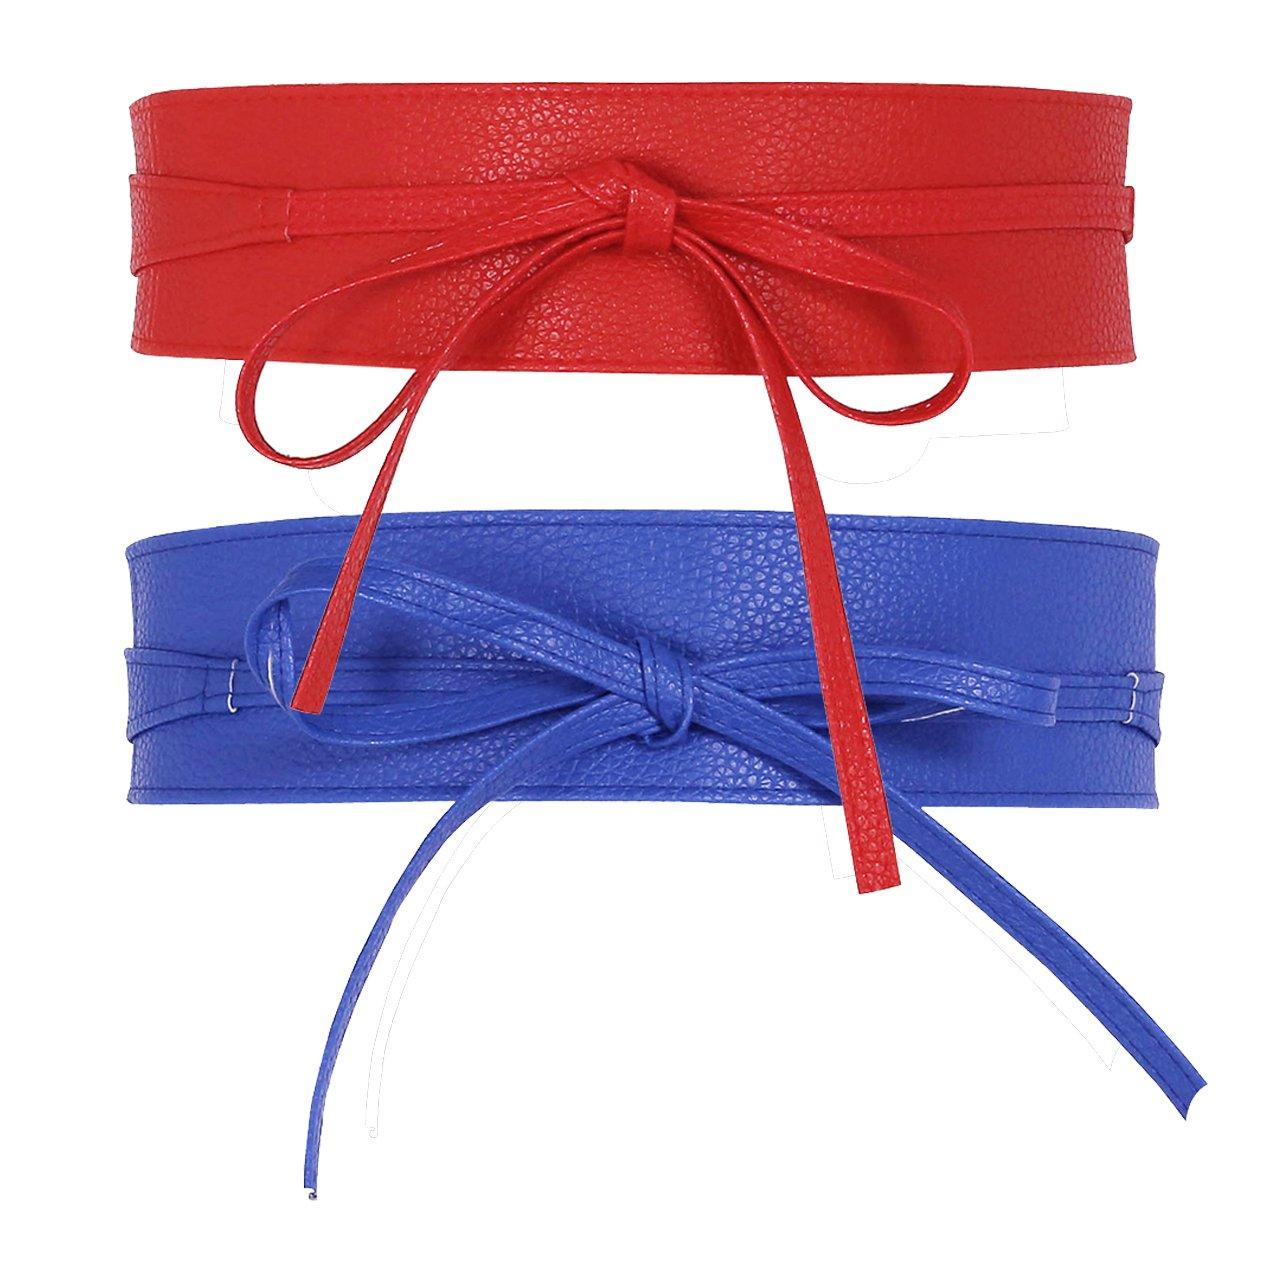 CHIC DIARY Fashion Women Faux Leather Bow Tie Waistband Elastic Stretch Waist Strap Cummerbund for Dress (#D-2pcs(red+blue))